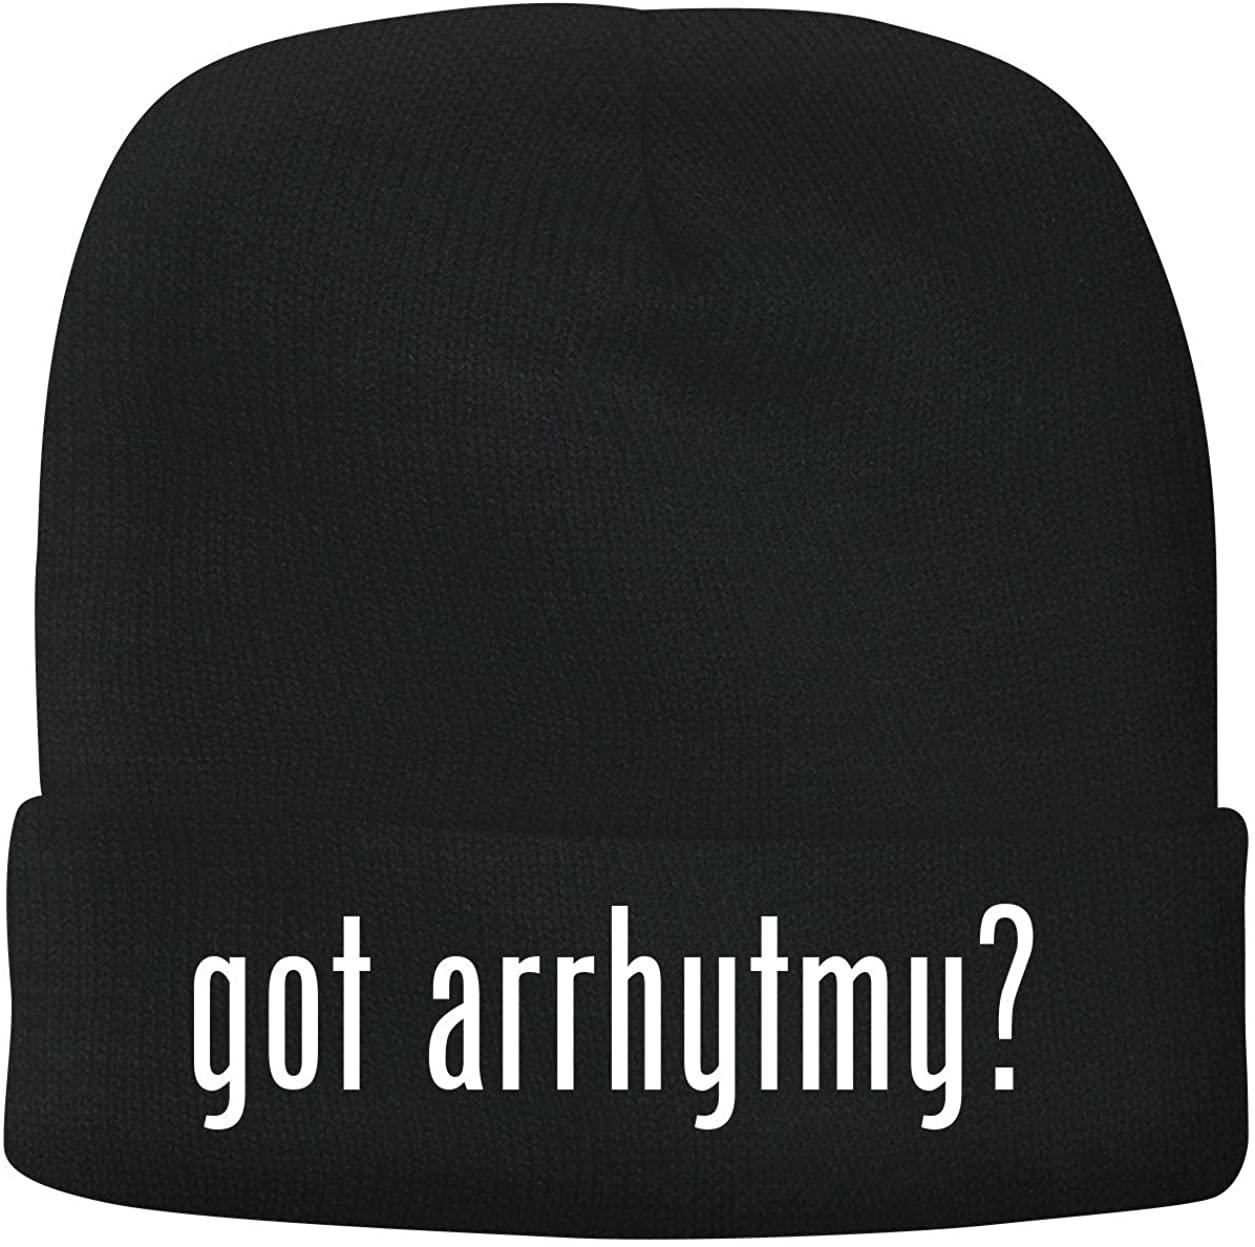 BH Cool Designs got Arrhytmy? - Mens Soft & Comfortable Beanie Hat Cap